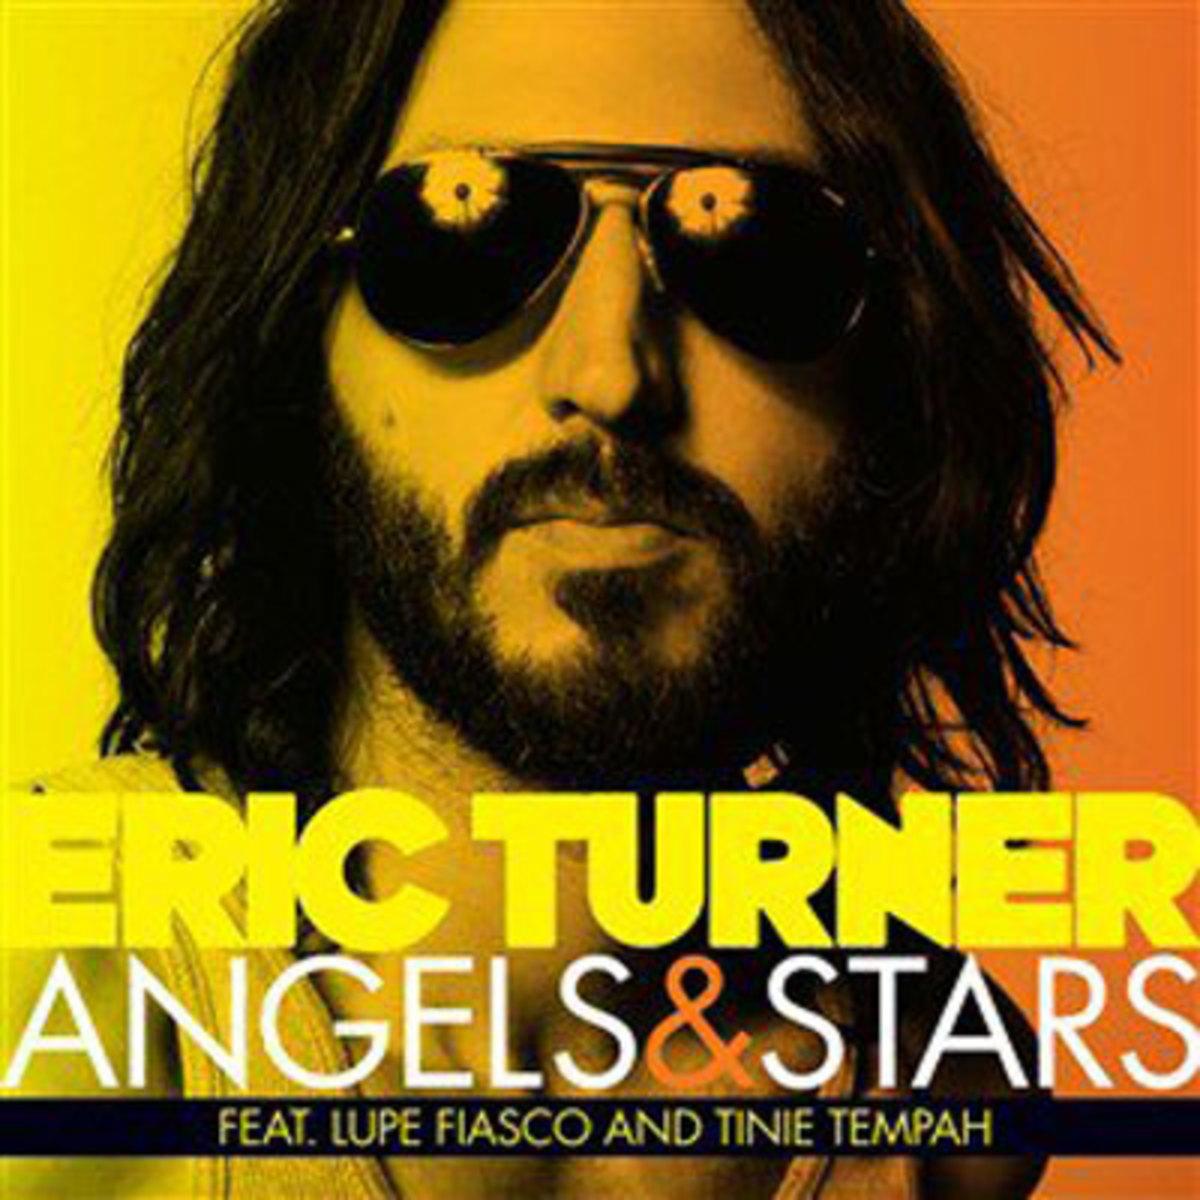 ericturner-angelsstars.jpg